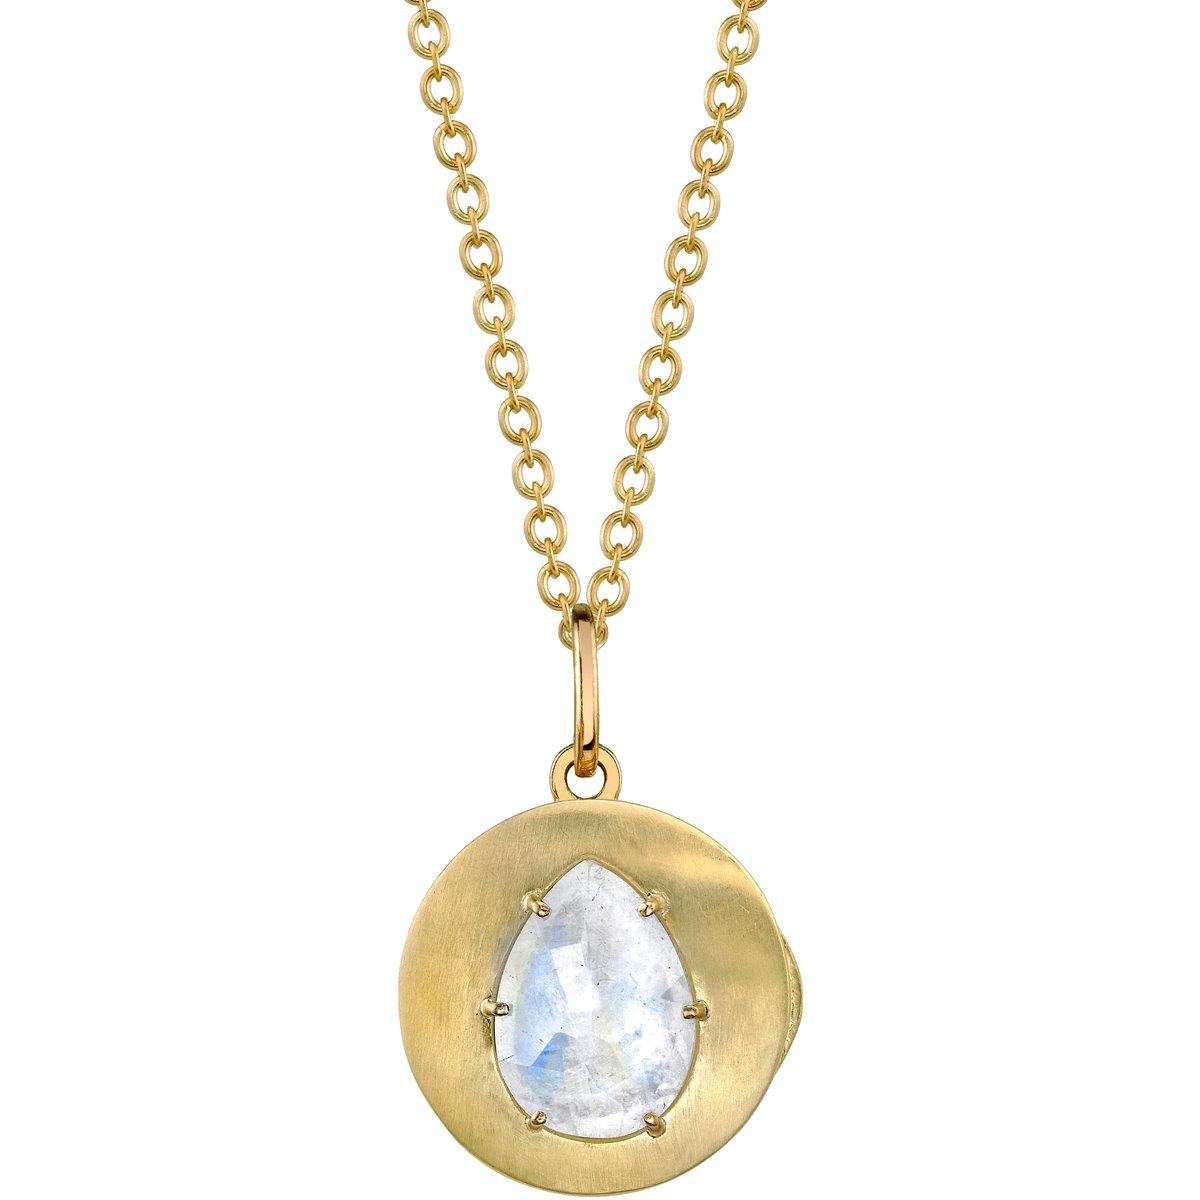 Irene Neuwirth Gold Rainbow Moonstone Locket Necklace In. Lockets Tear Lockets. Jewelry Lockets. Multicolor Lockets. Name Connor Lockets. Hanuman Pendant Lockets. Silver Lockets. Stacked Lockets. Malabar Lockets